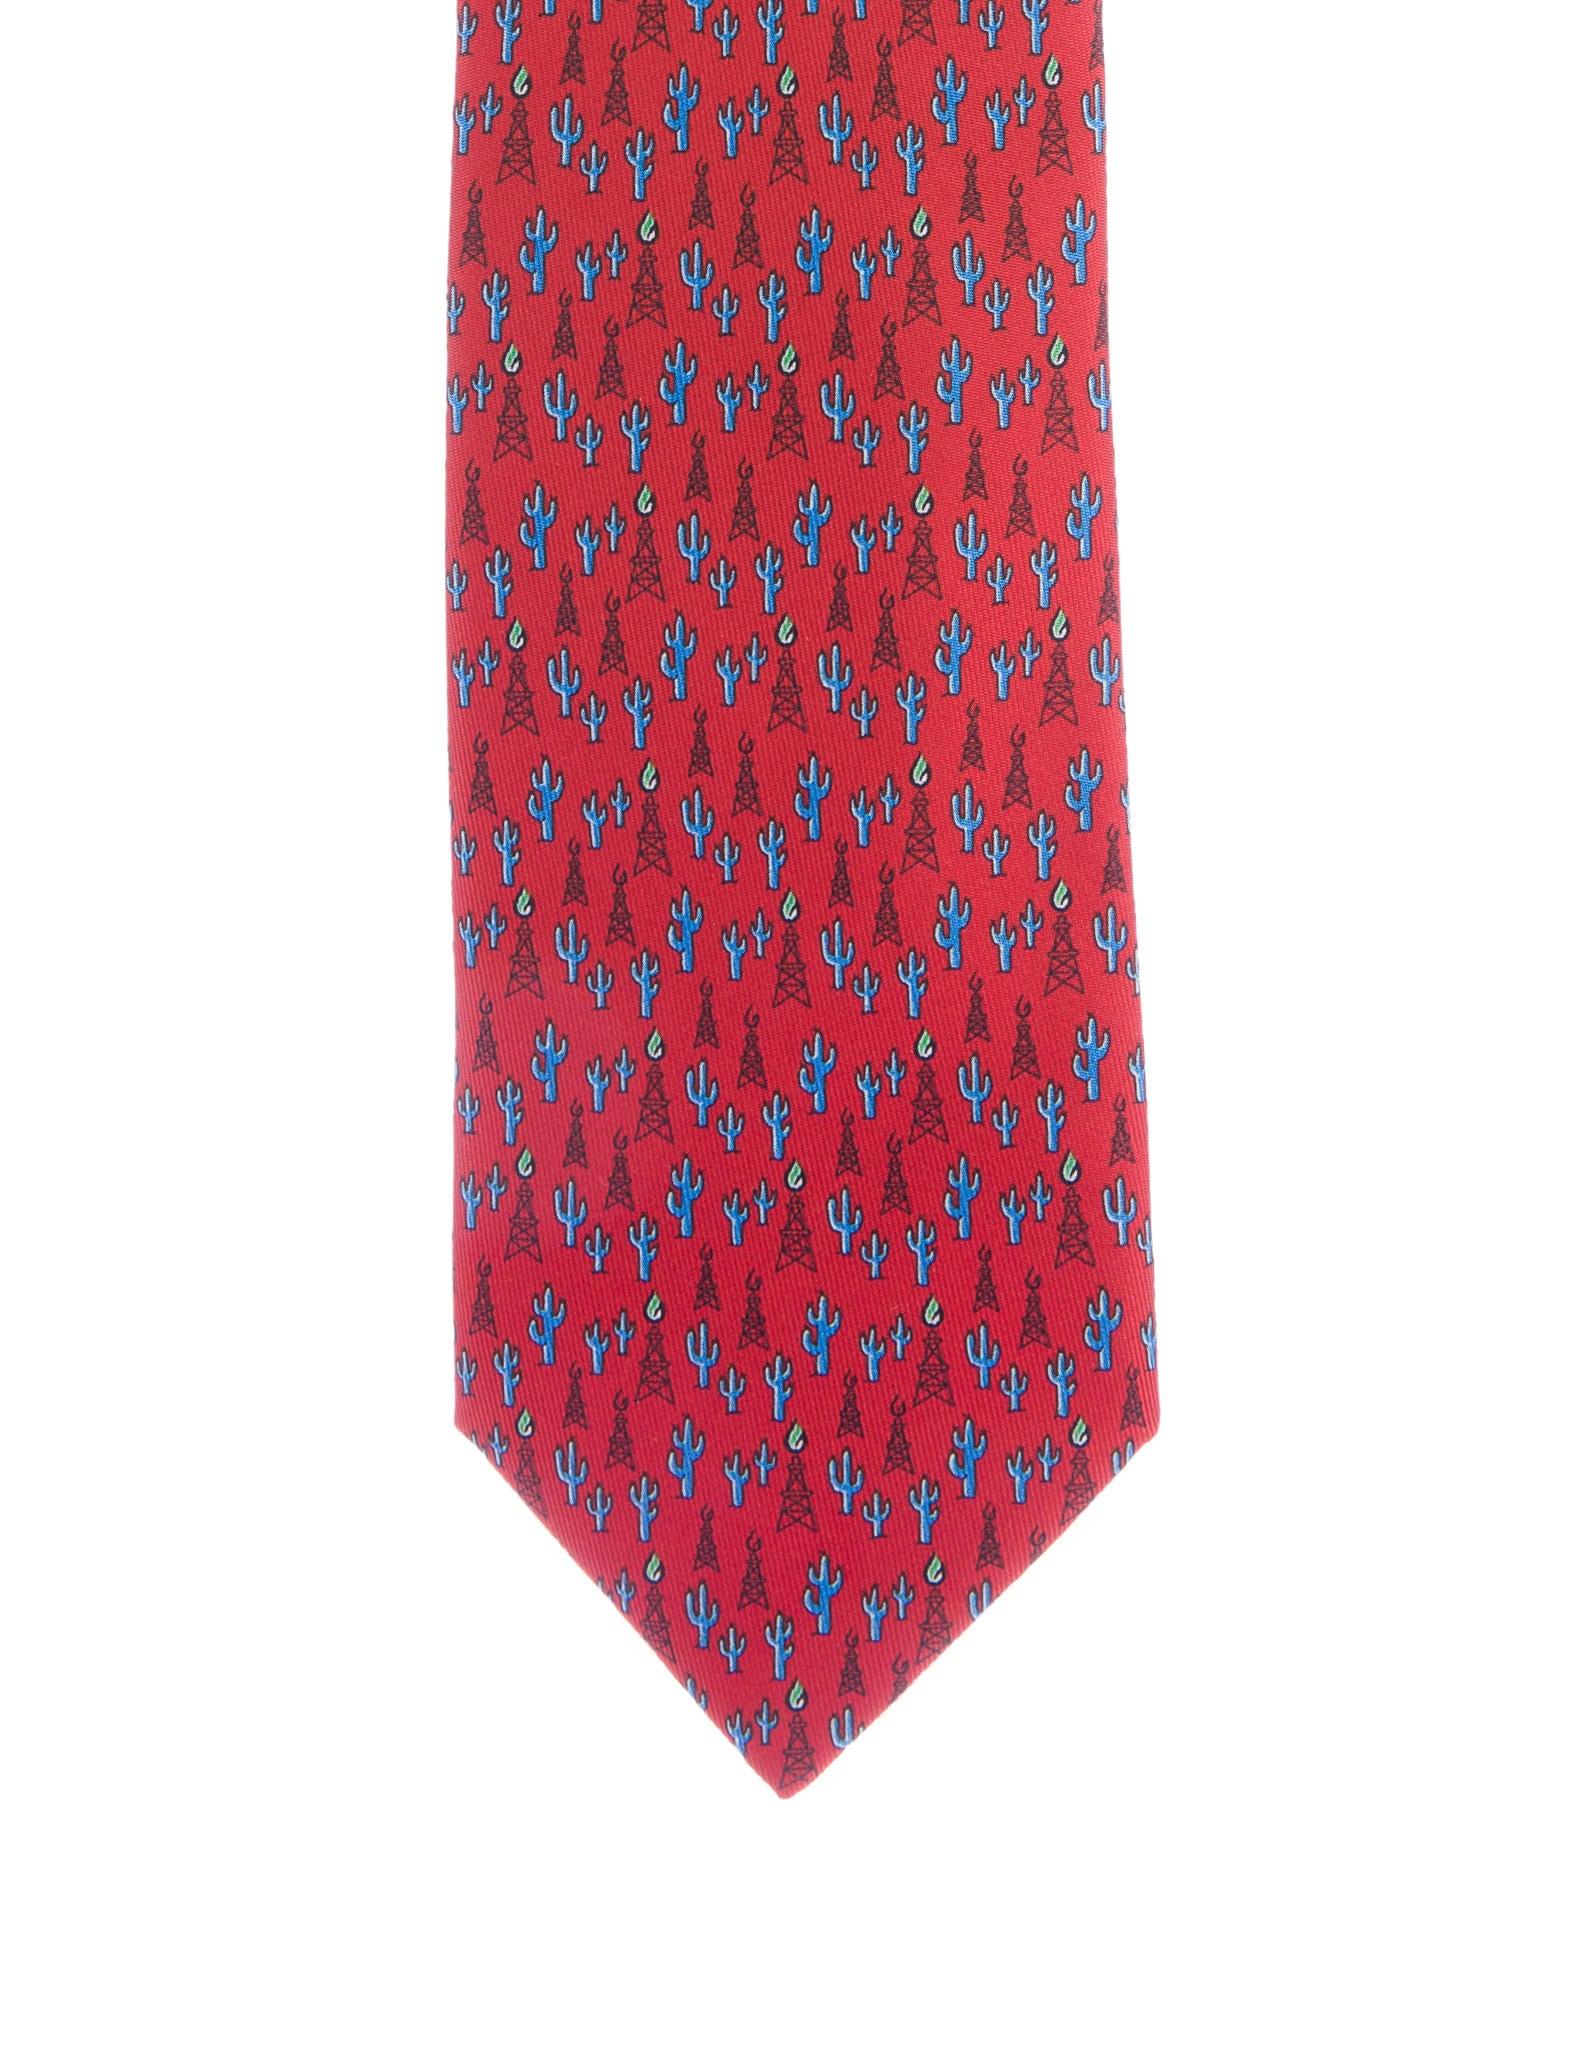 1badedb86661 Hermès Cactus & Pylon Print Silk Tie - Suiting Accessories ...